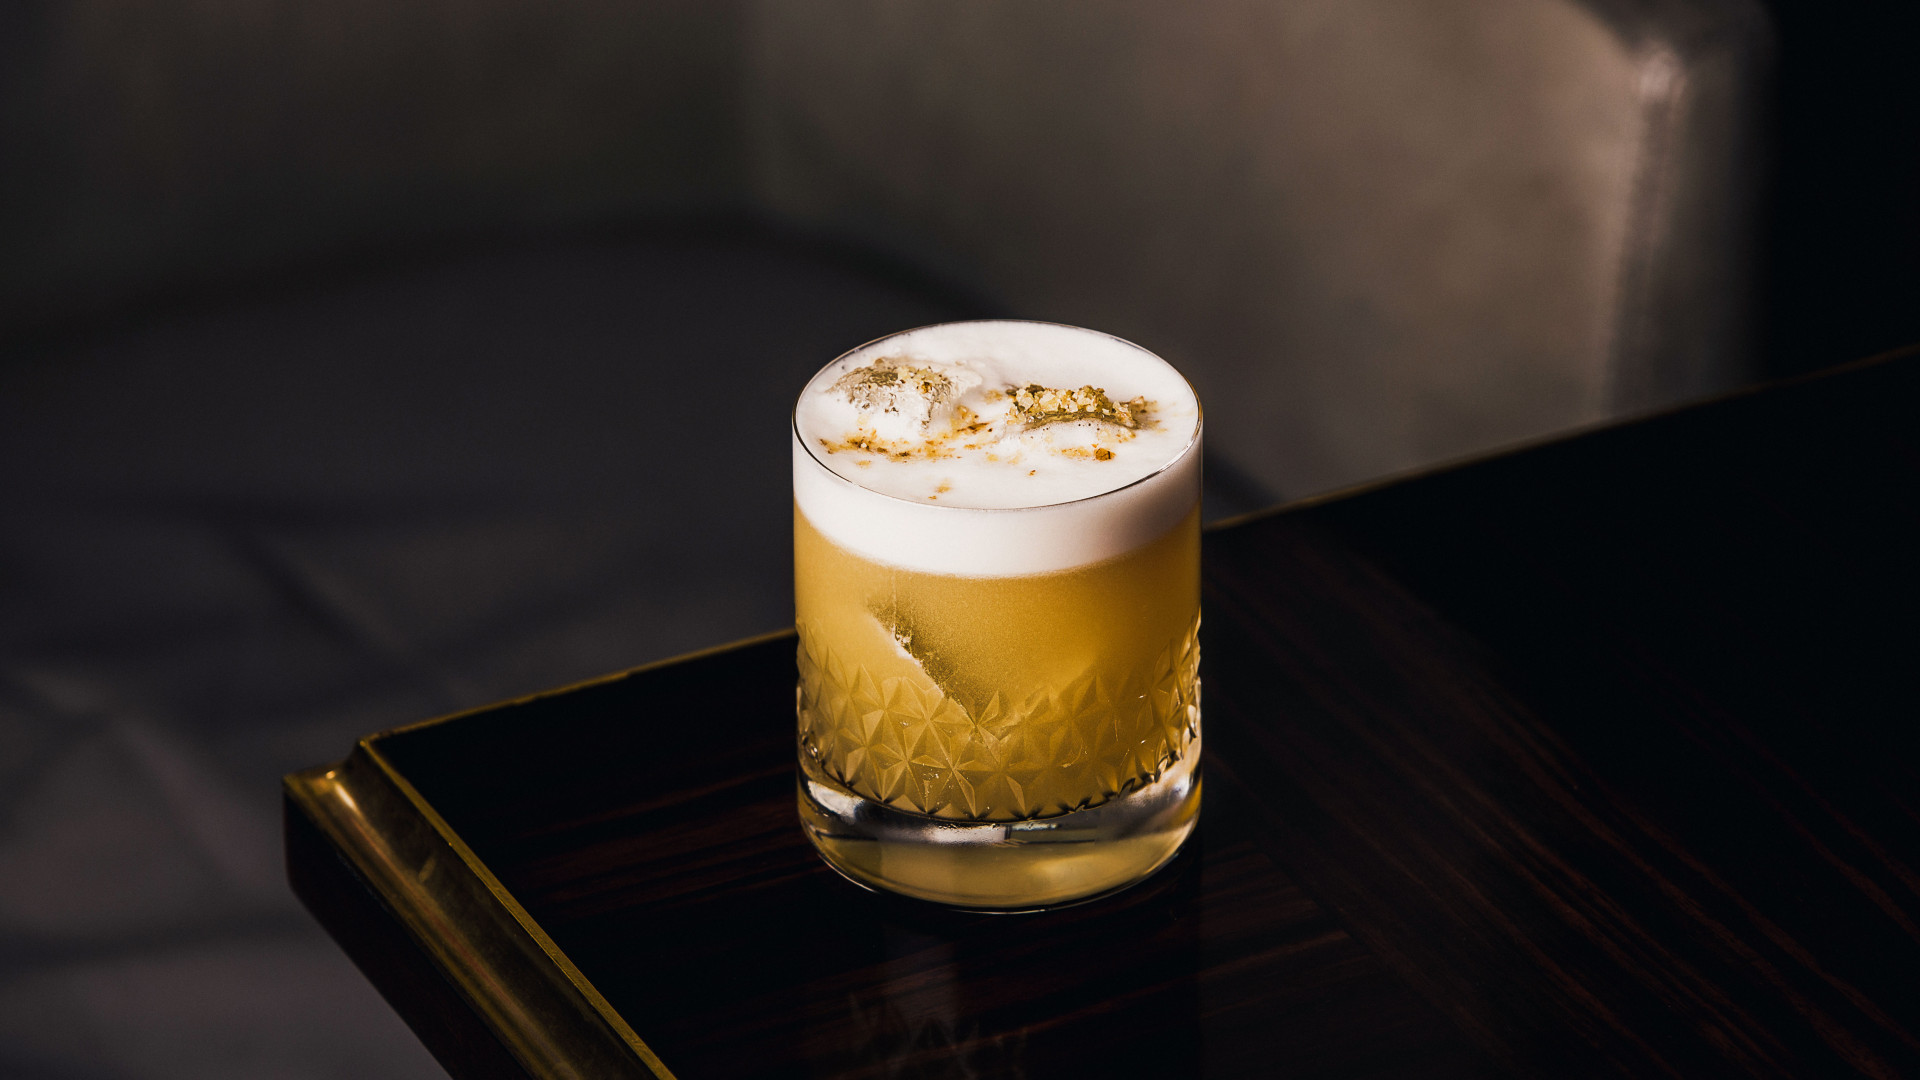 Cedar Oak cocktail from the Bassoon Bar at the Corinthia Hotel London